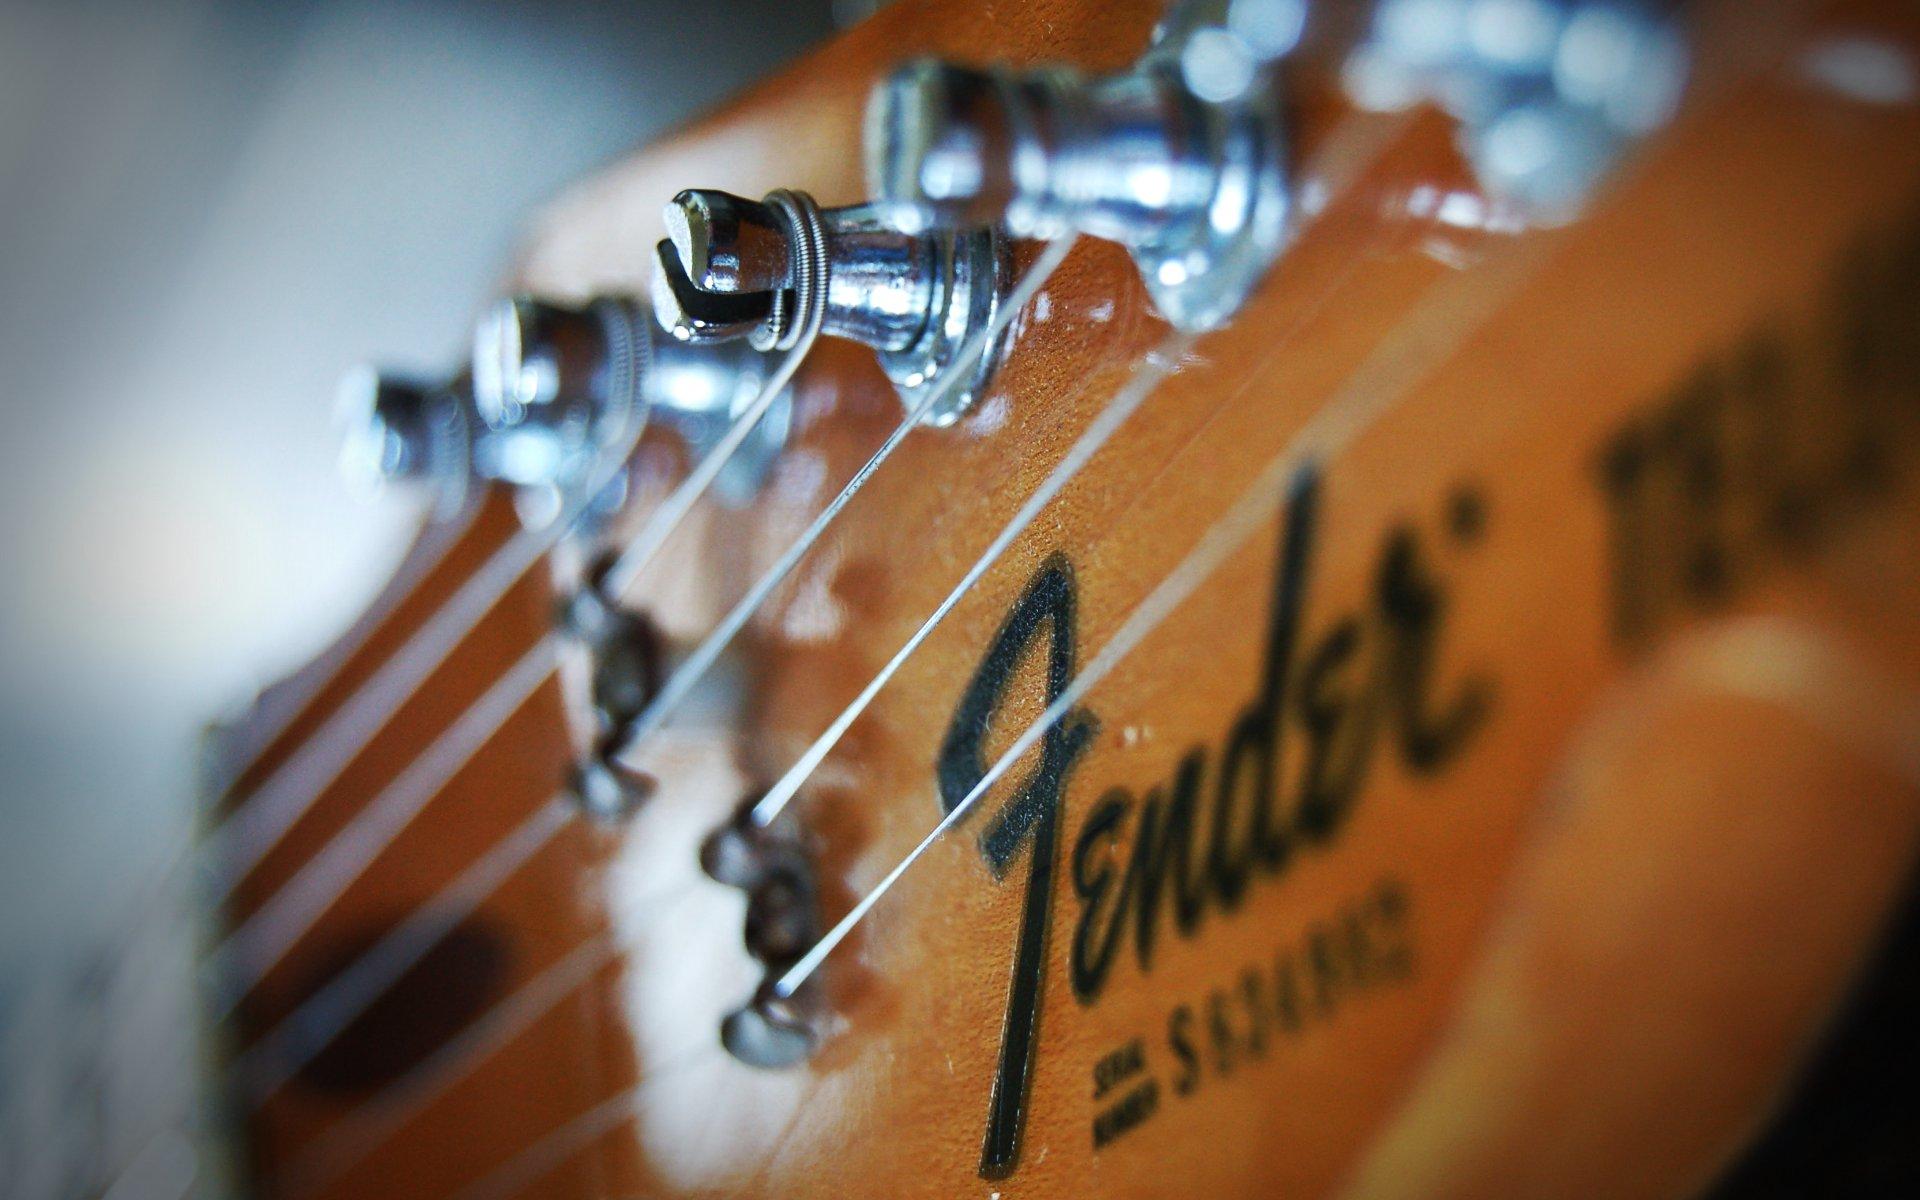 Fender Guitar Wallpaper PC 7142 Wallpaper Wallpaper Screen 1920x1200